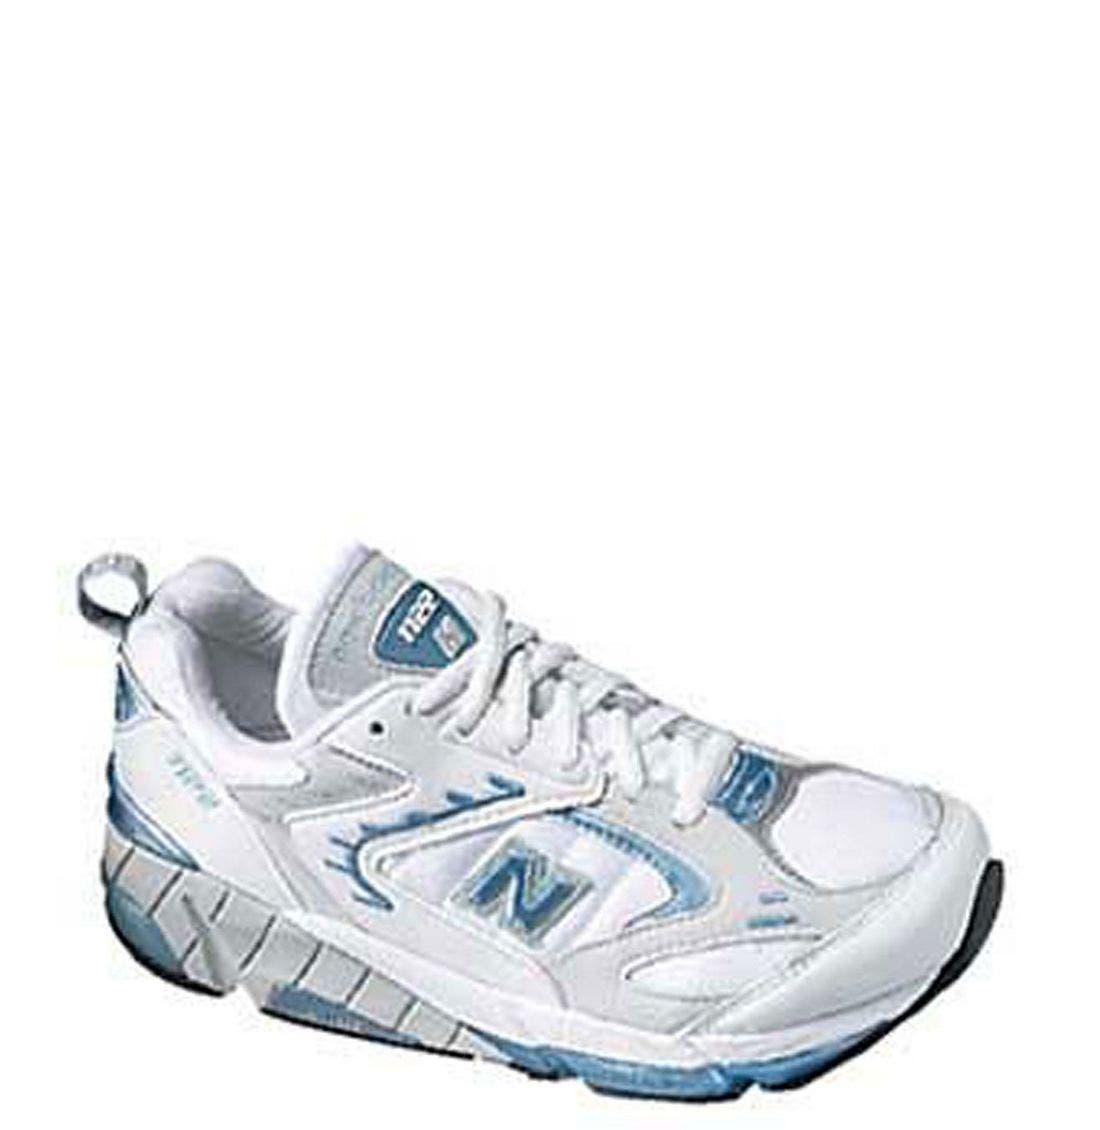 'W1122' Running Shoe,                             Main thumbnail 1, color,                             110